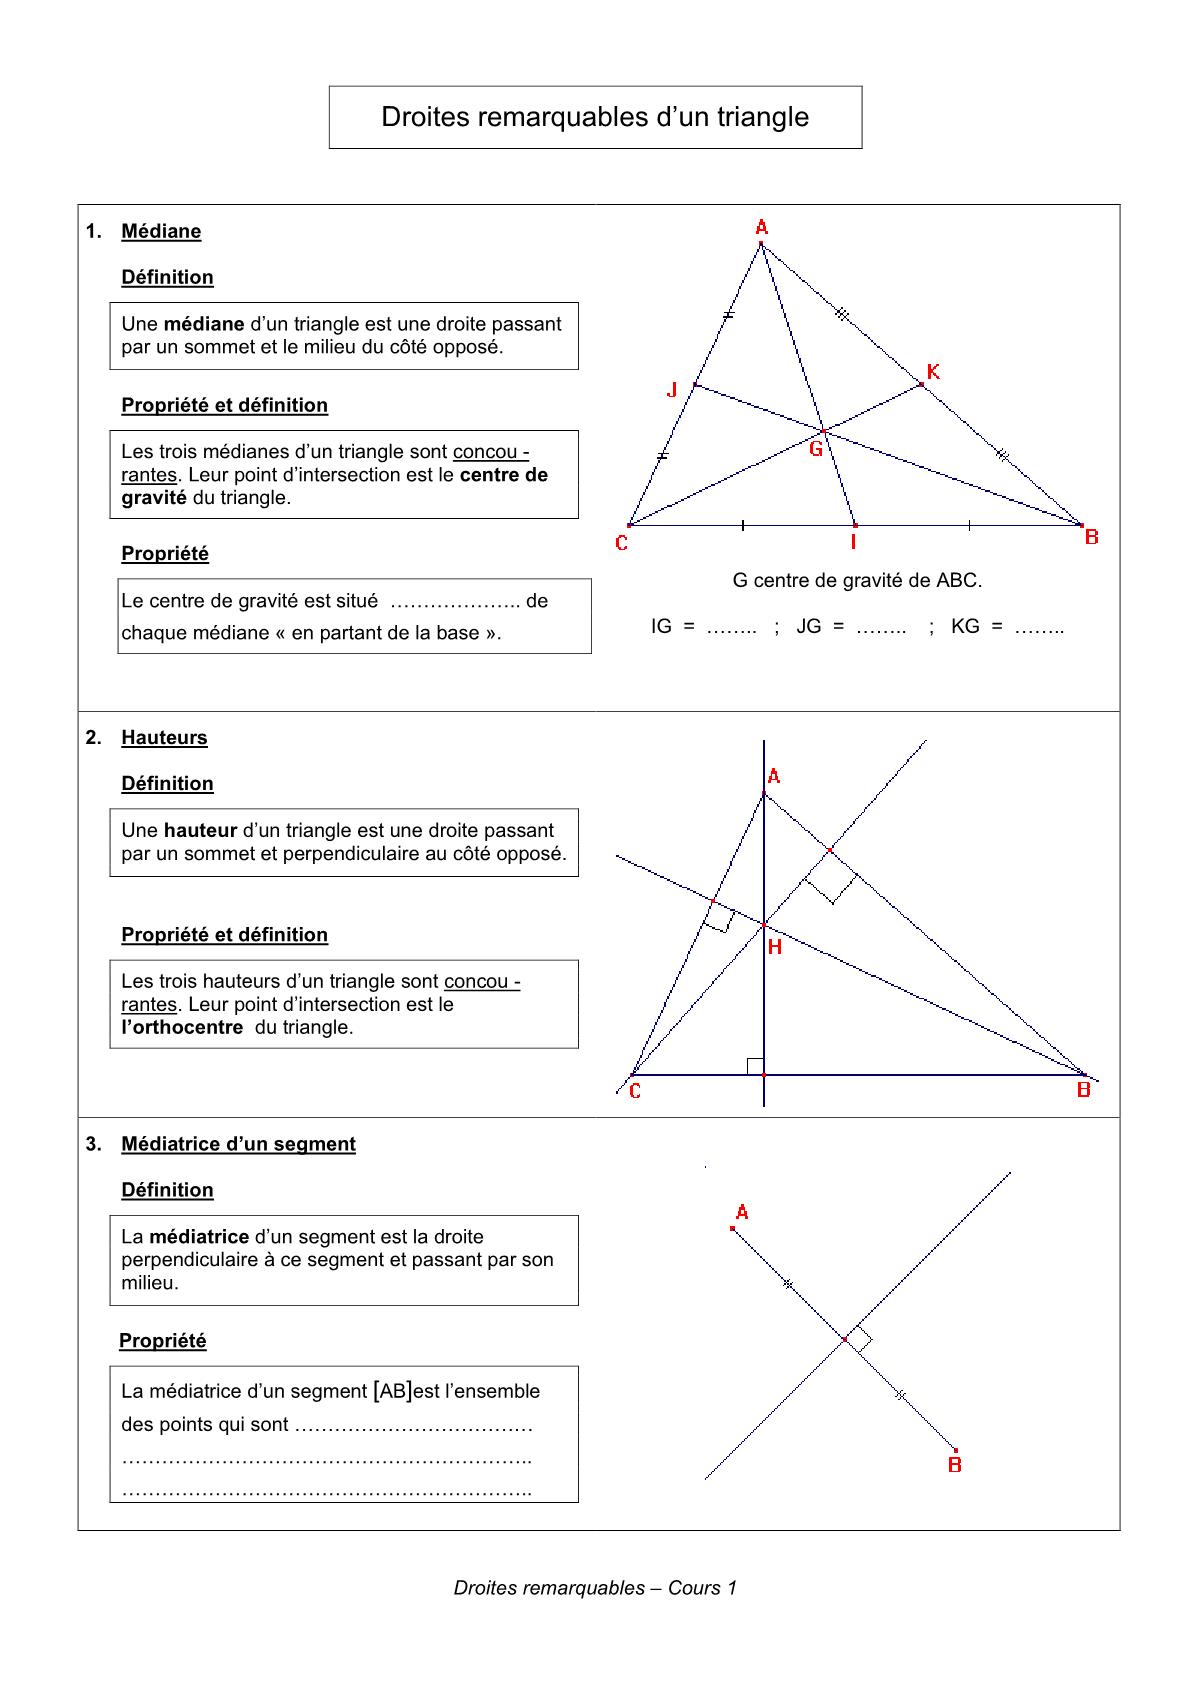 درس Droites remarquables d'un triangle للسنة الأولى اعدادي